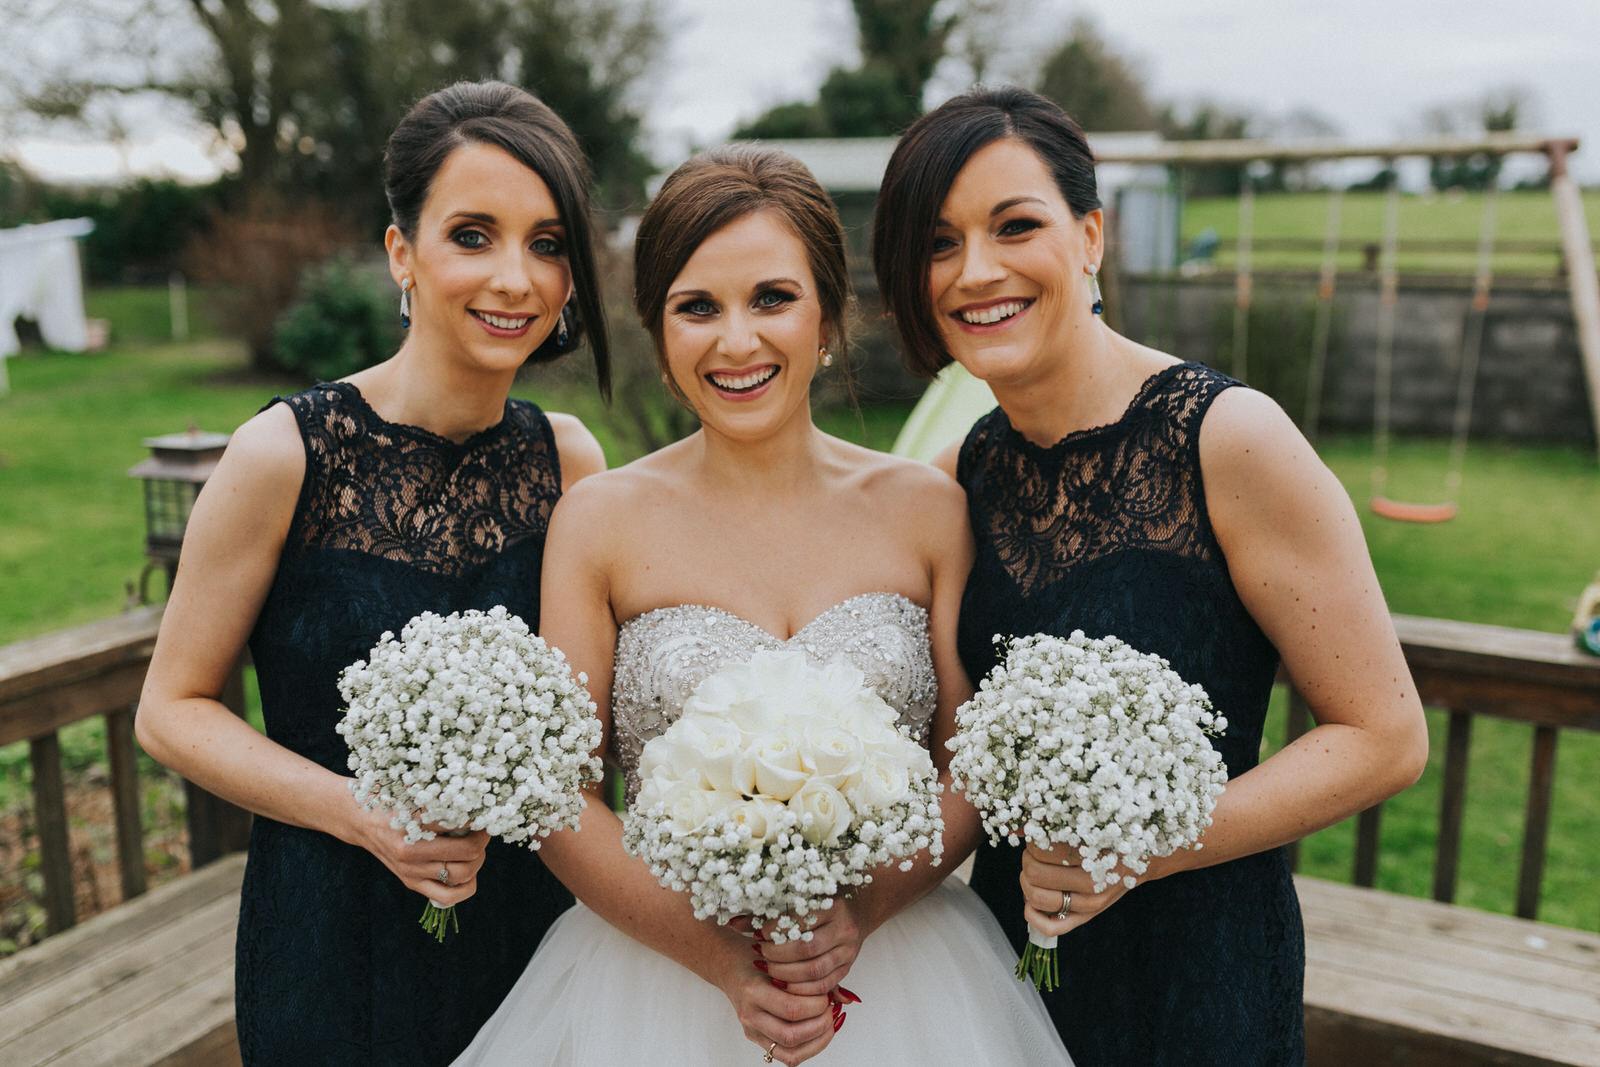 Clonabreany_wedding-photographer_roger_kenny_ireland_032.jpg